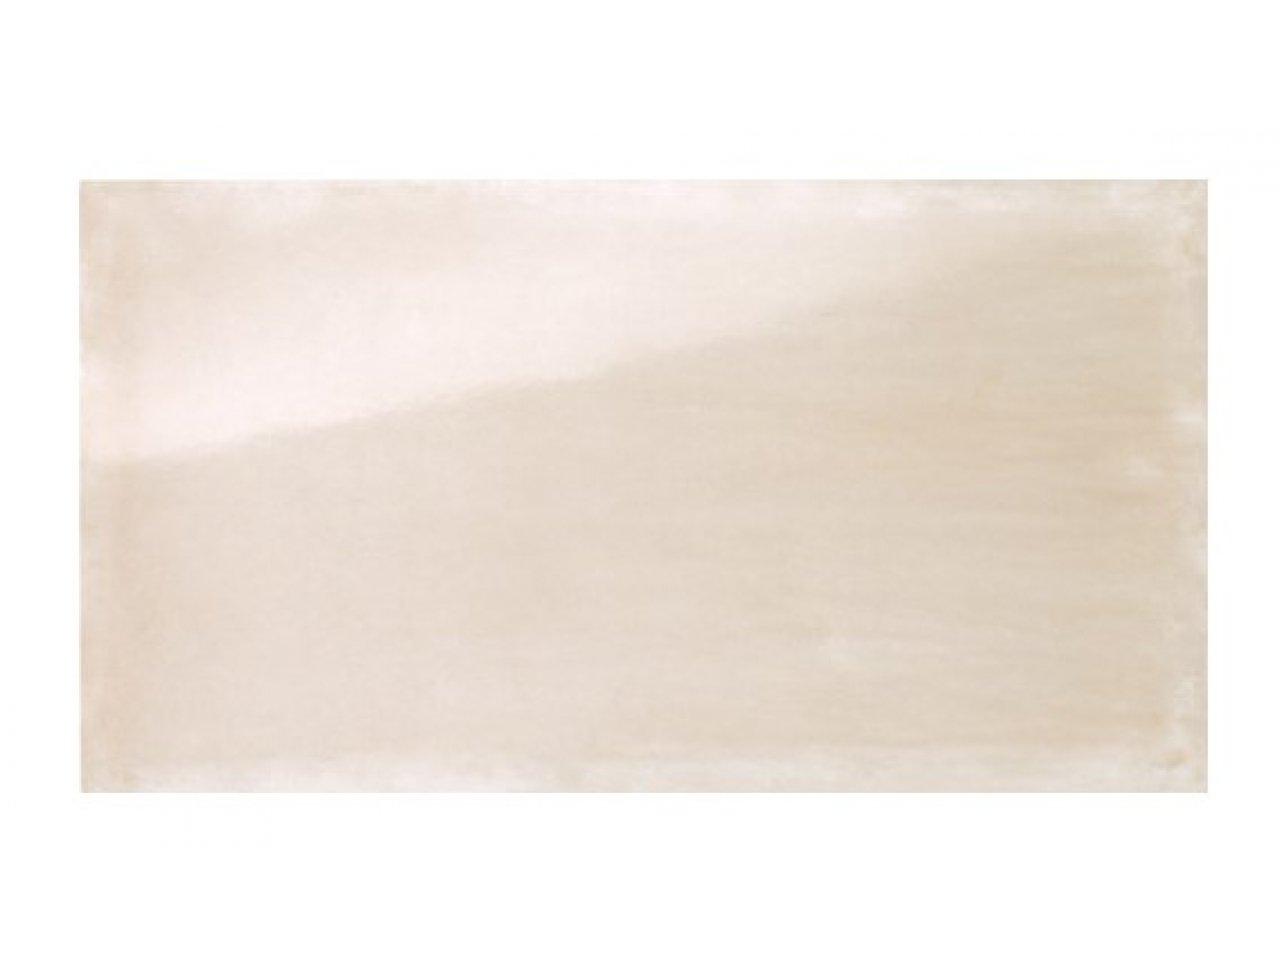 Настенная плитка FAP Frame Sand 30.5 x 56 см, Арт. fLEG